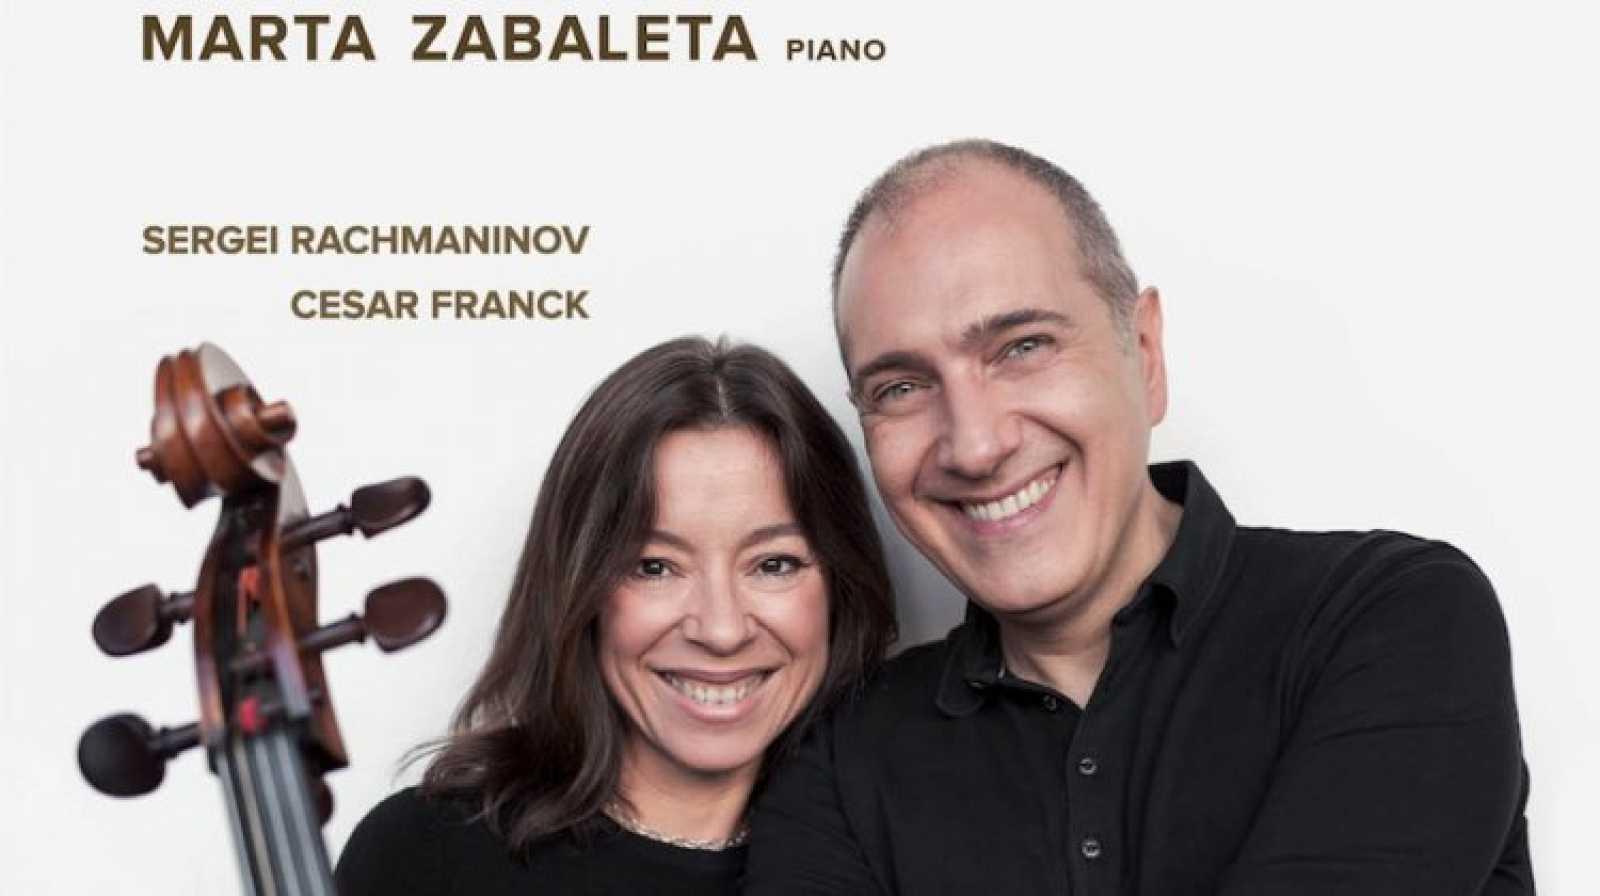 La dársena - Asier Polo y Marta Zabaleta - 20/05/17 - escuchar ahora